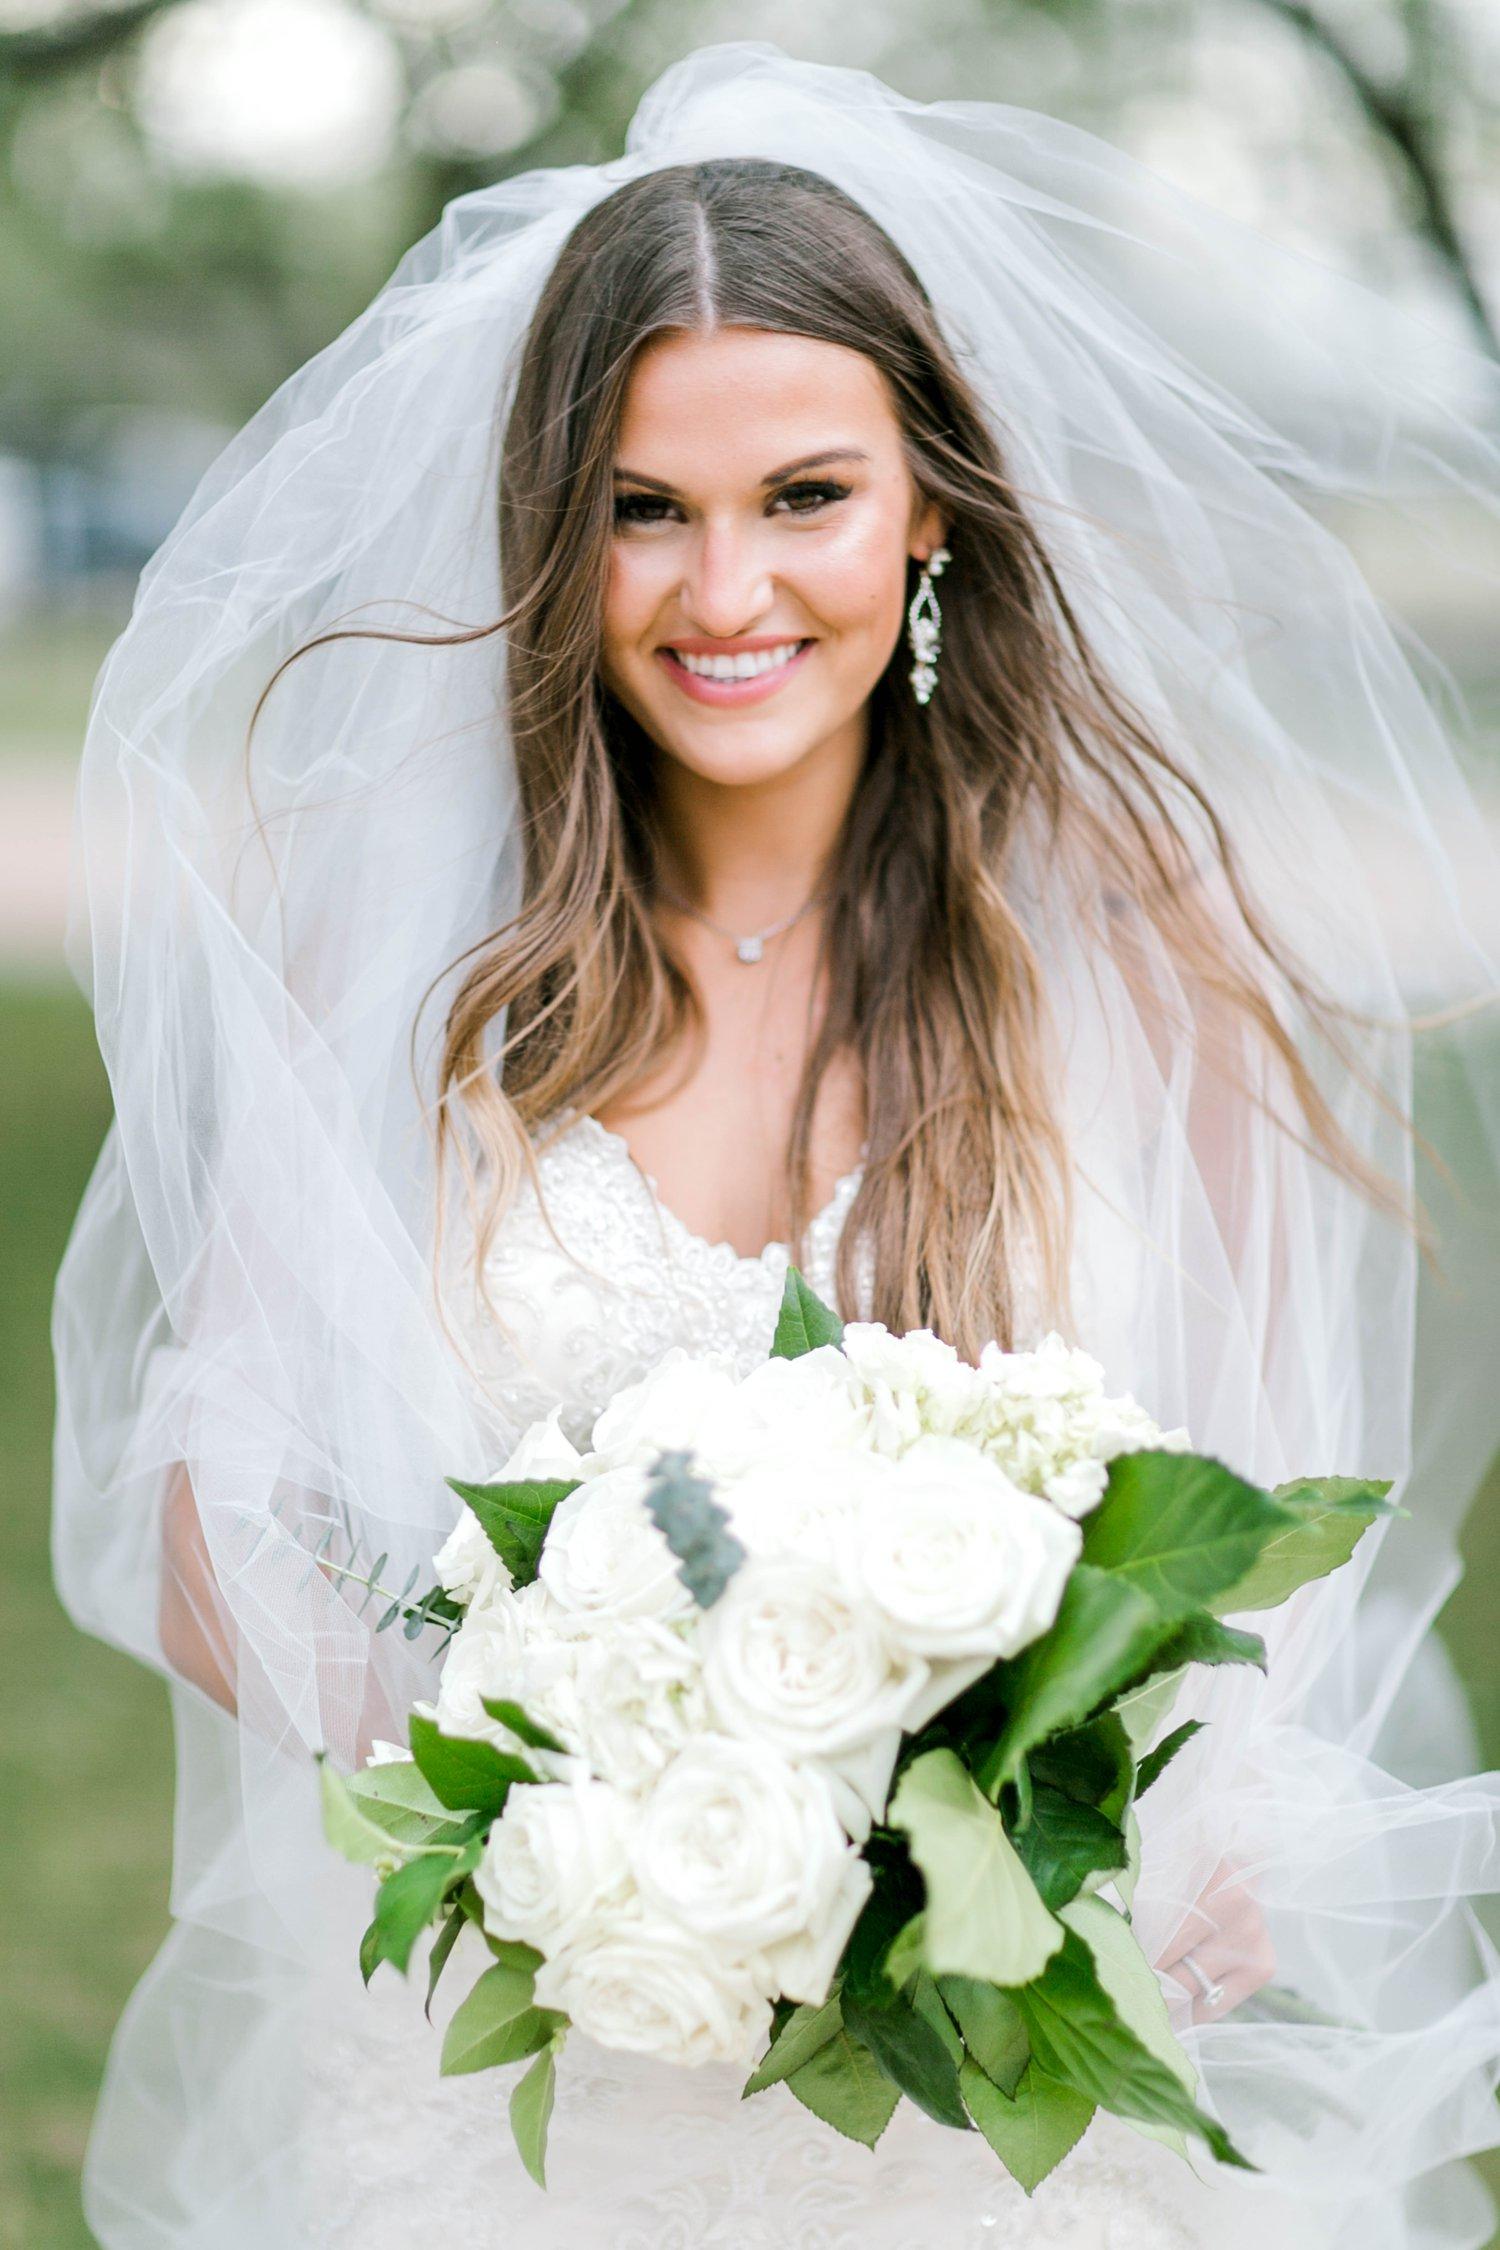 Kendra_Hill_Bridals_ALLEEJ_Lubbock_Wedding_Photographer_LHUCA_0046.jpg